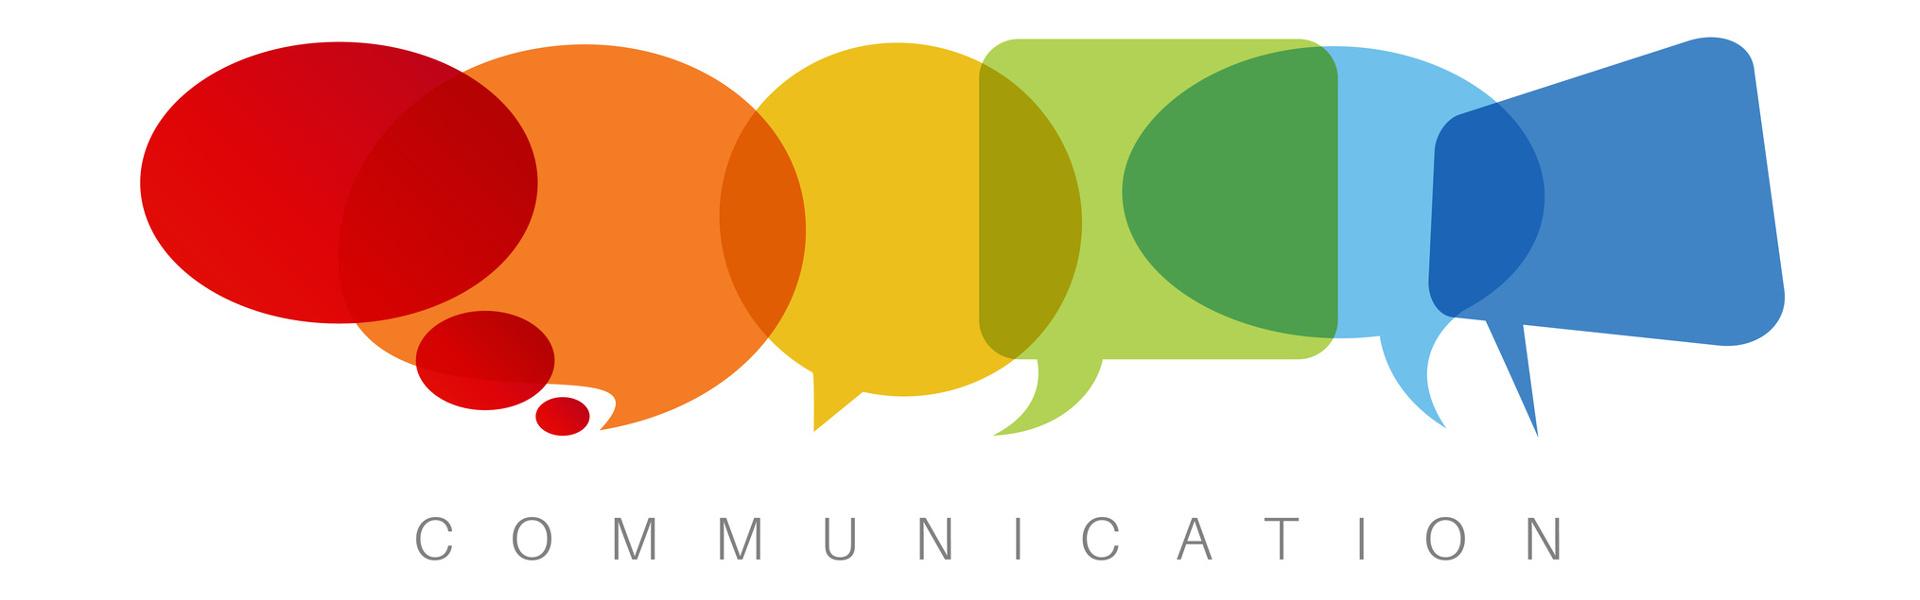 slider_communication_1920x600